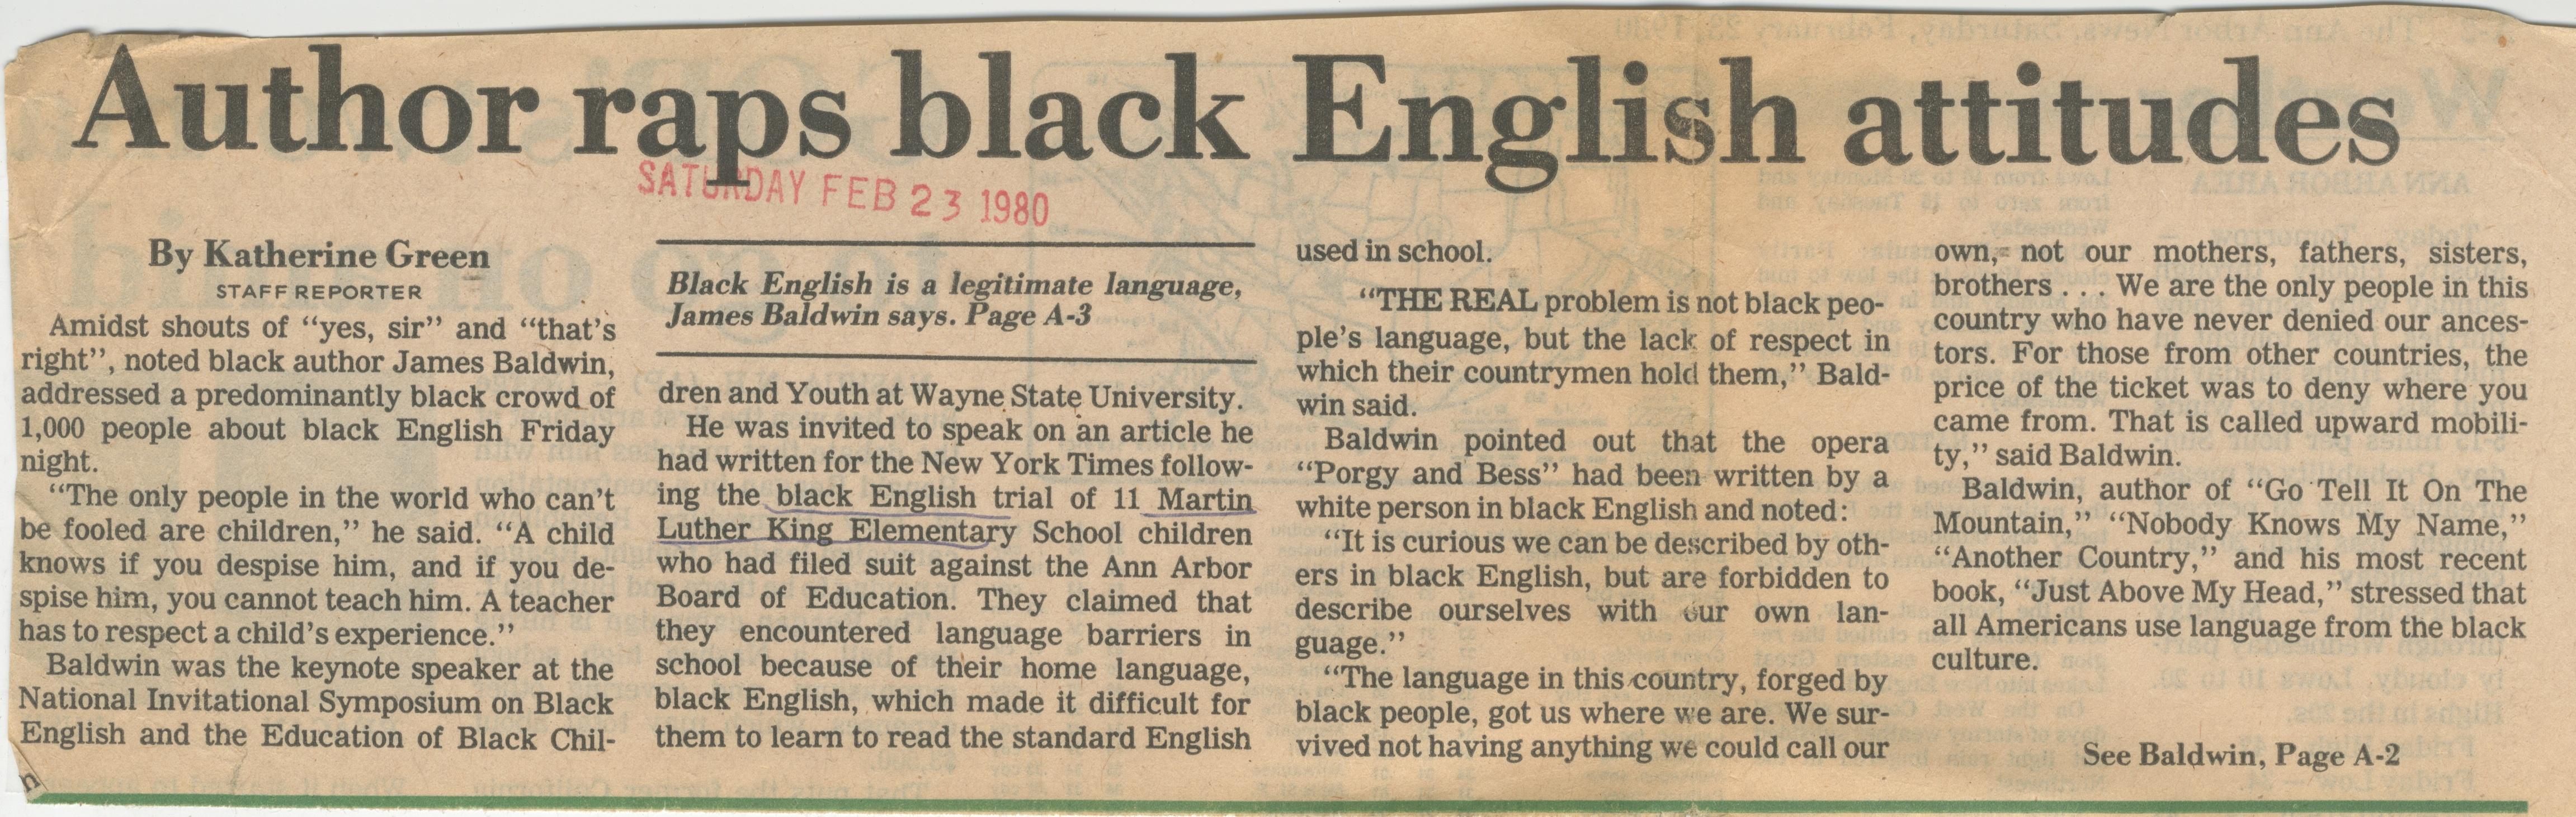 james baldwin black english